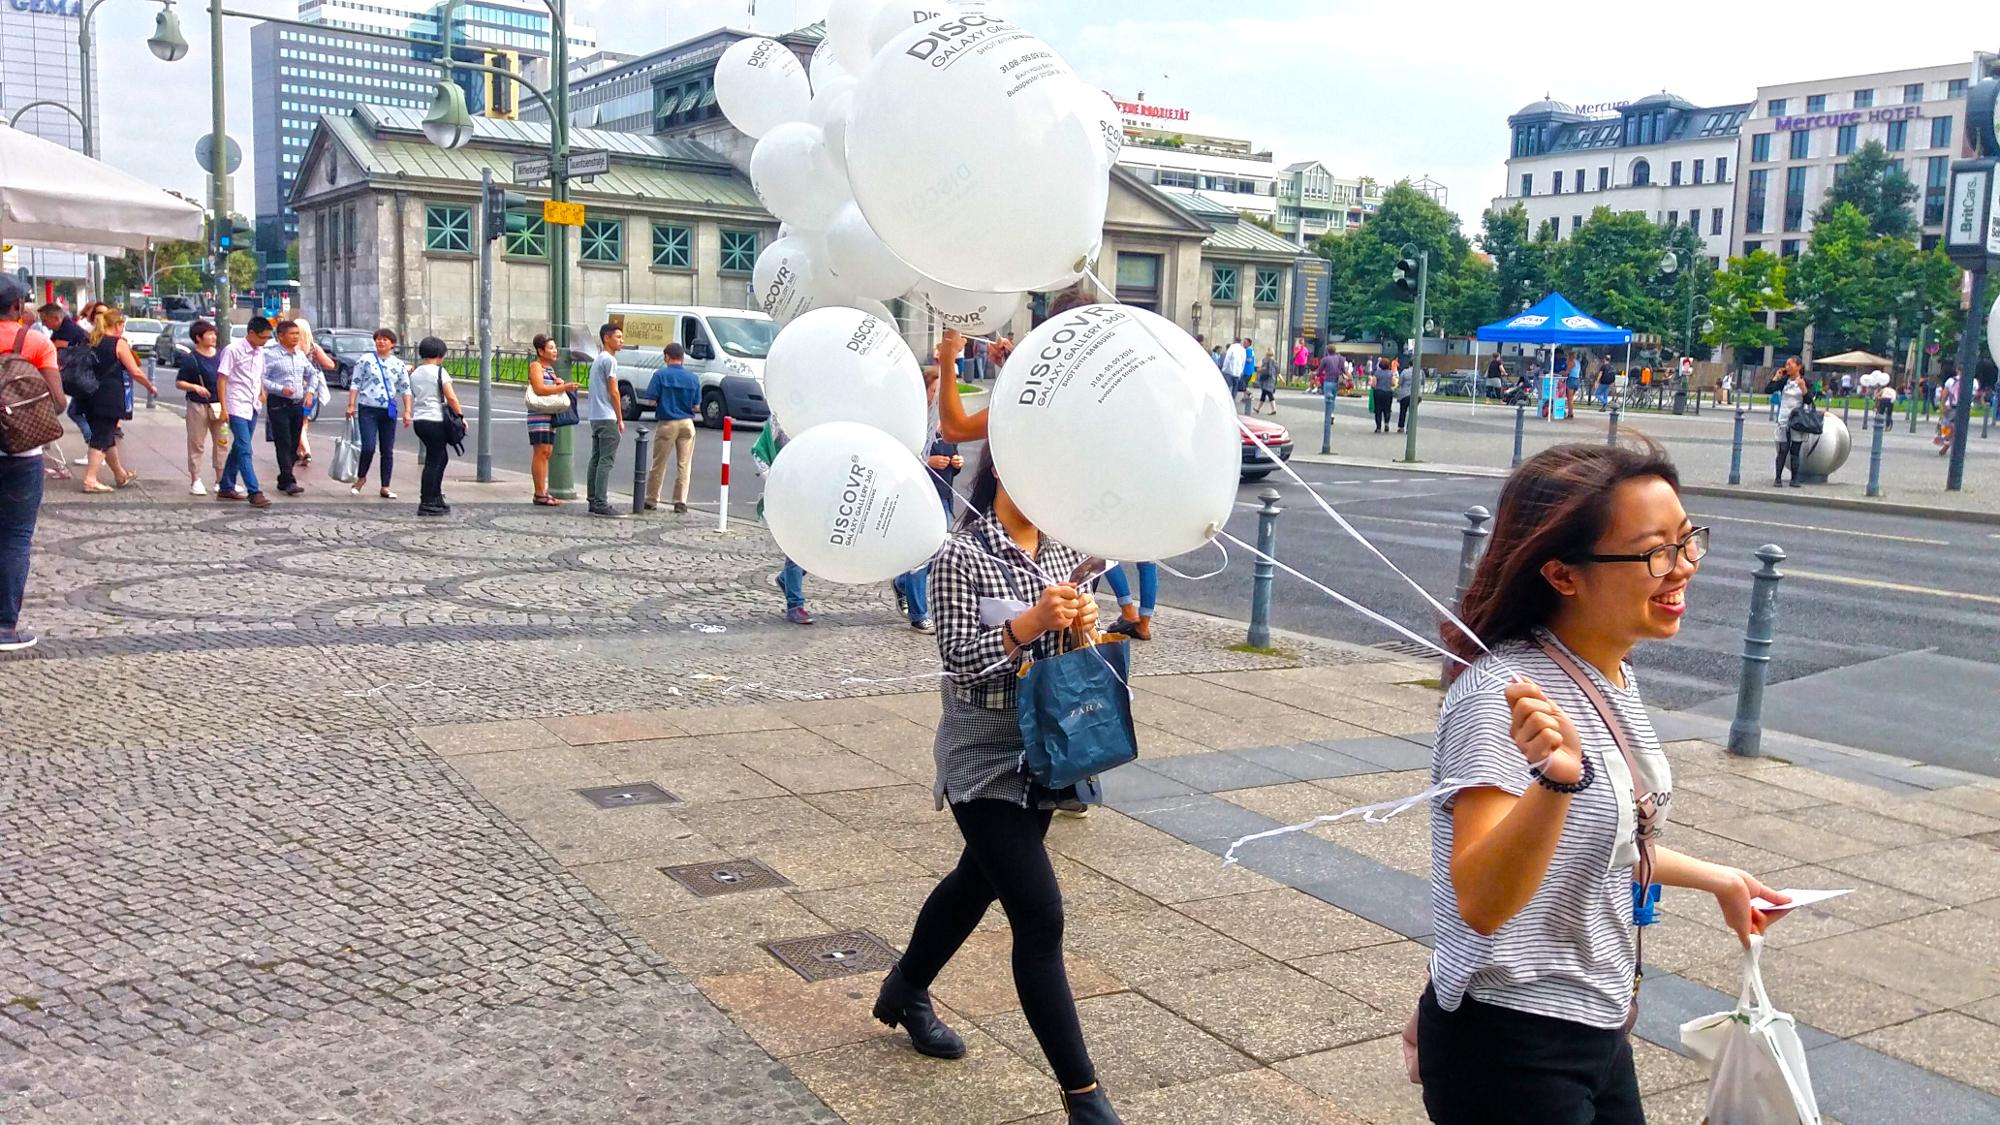 Promotion Idee - Werbung mit Luftballons